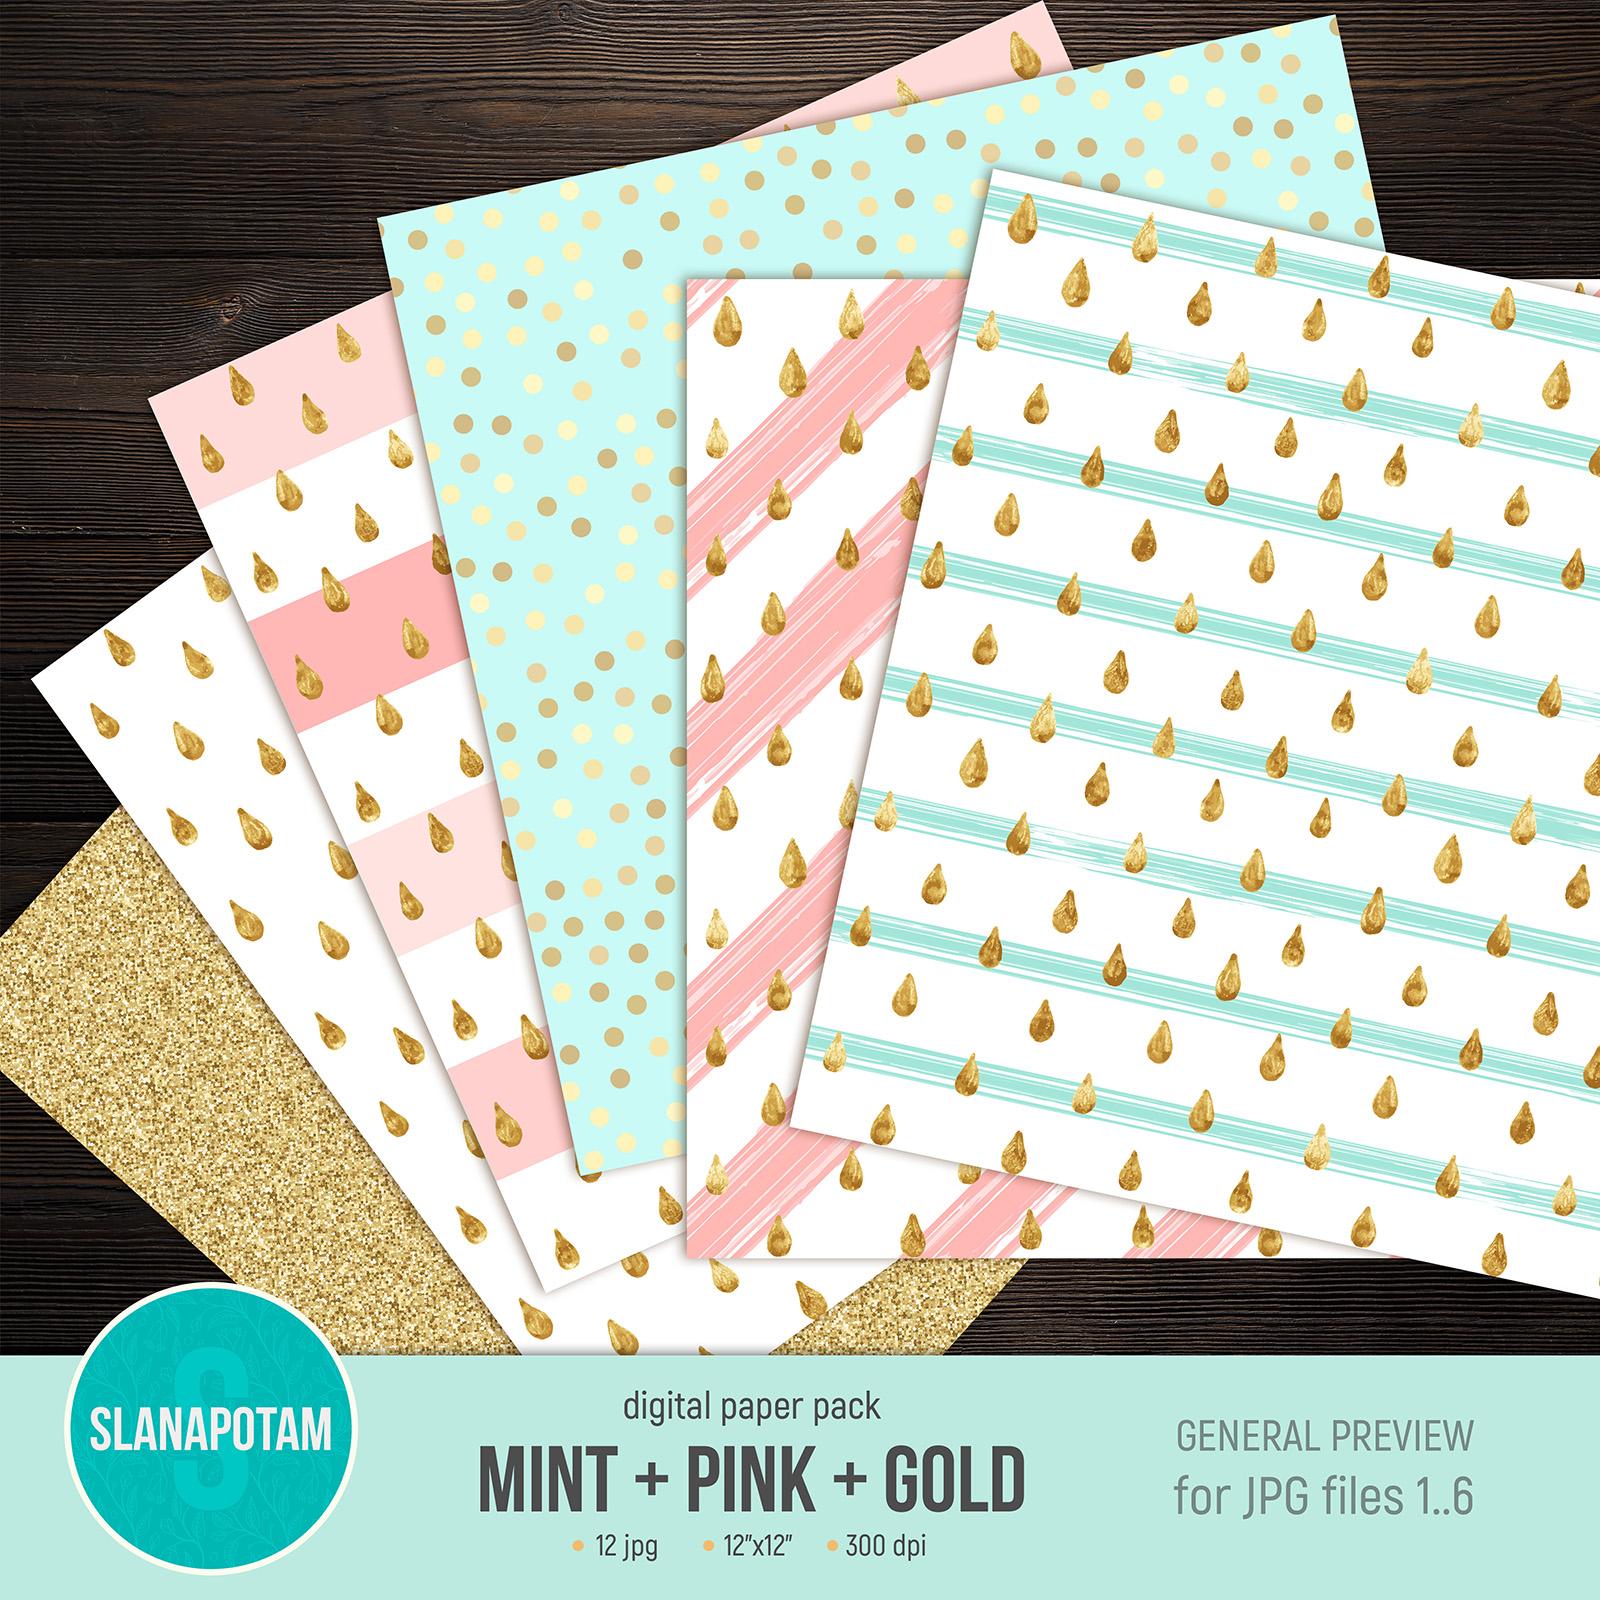 MINT-PINK-GOLD digital paper pack, 12 files